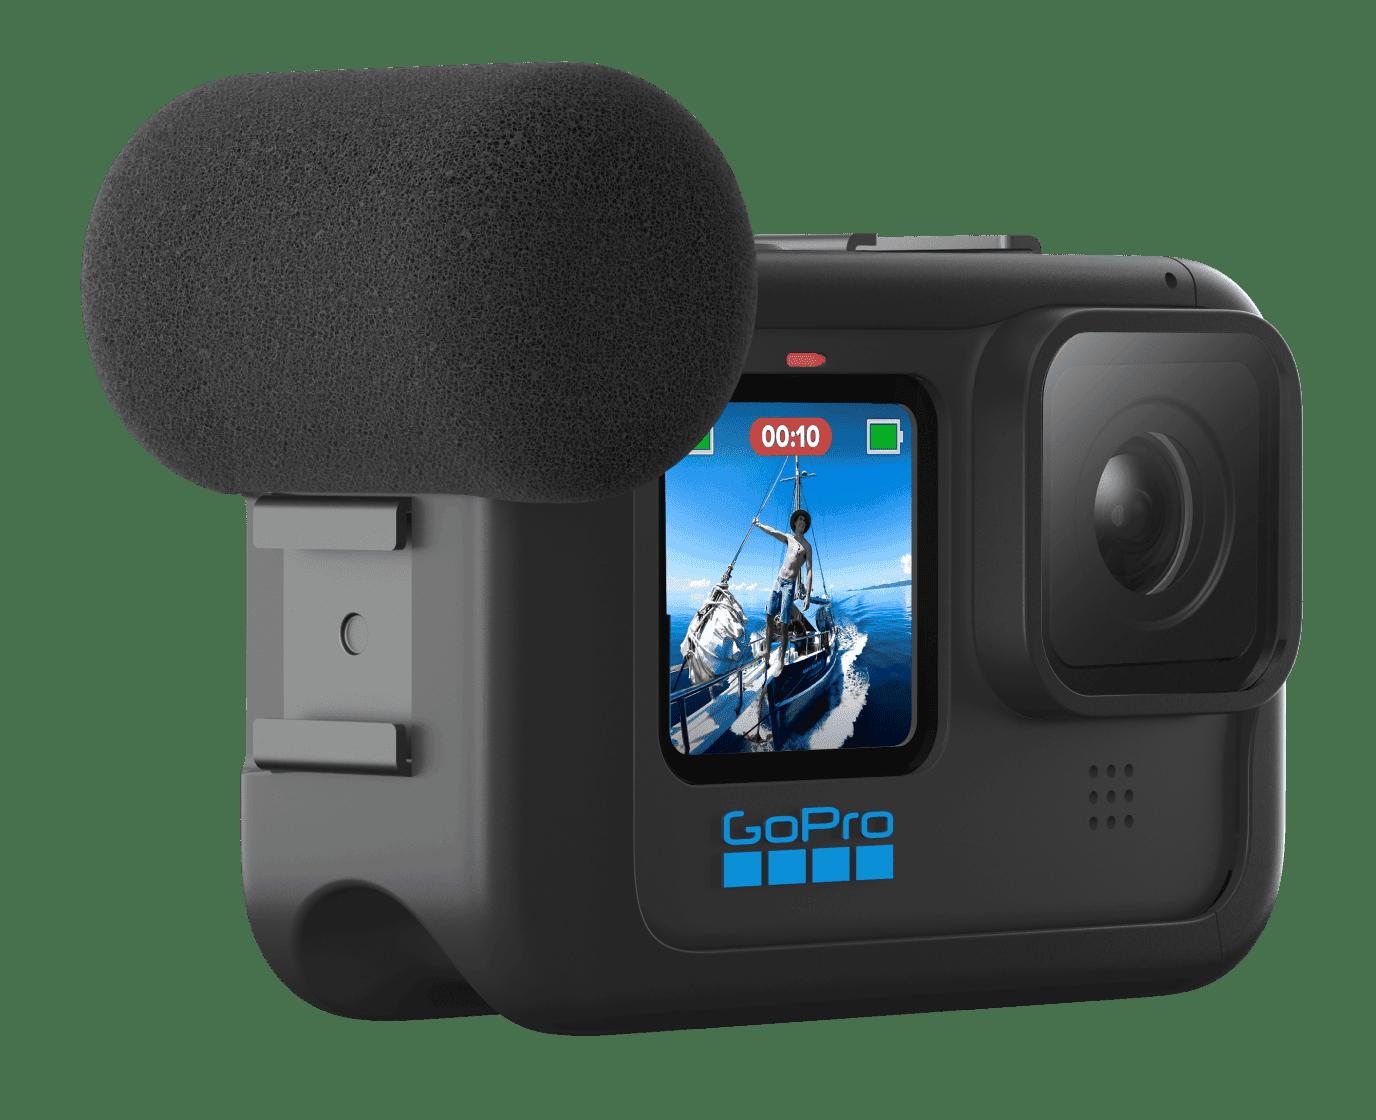 HERO9 Black Kamera Media Mod-Vorderseite-Bild